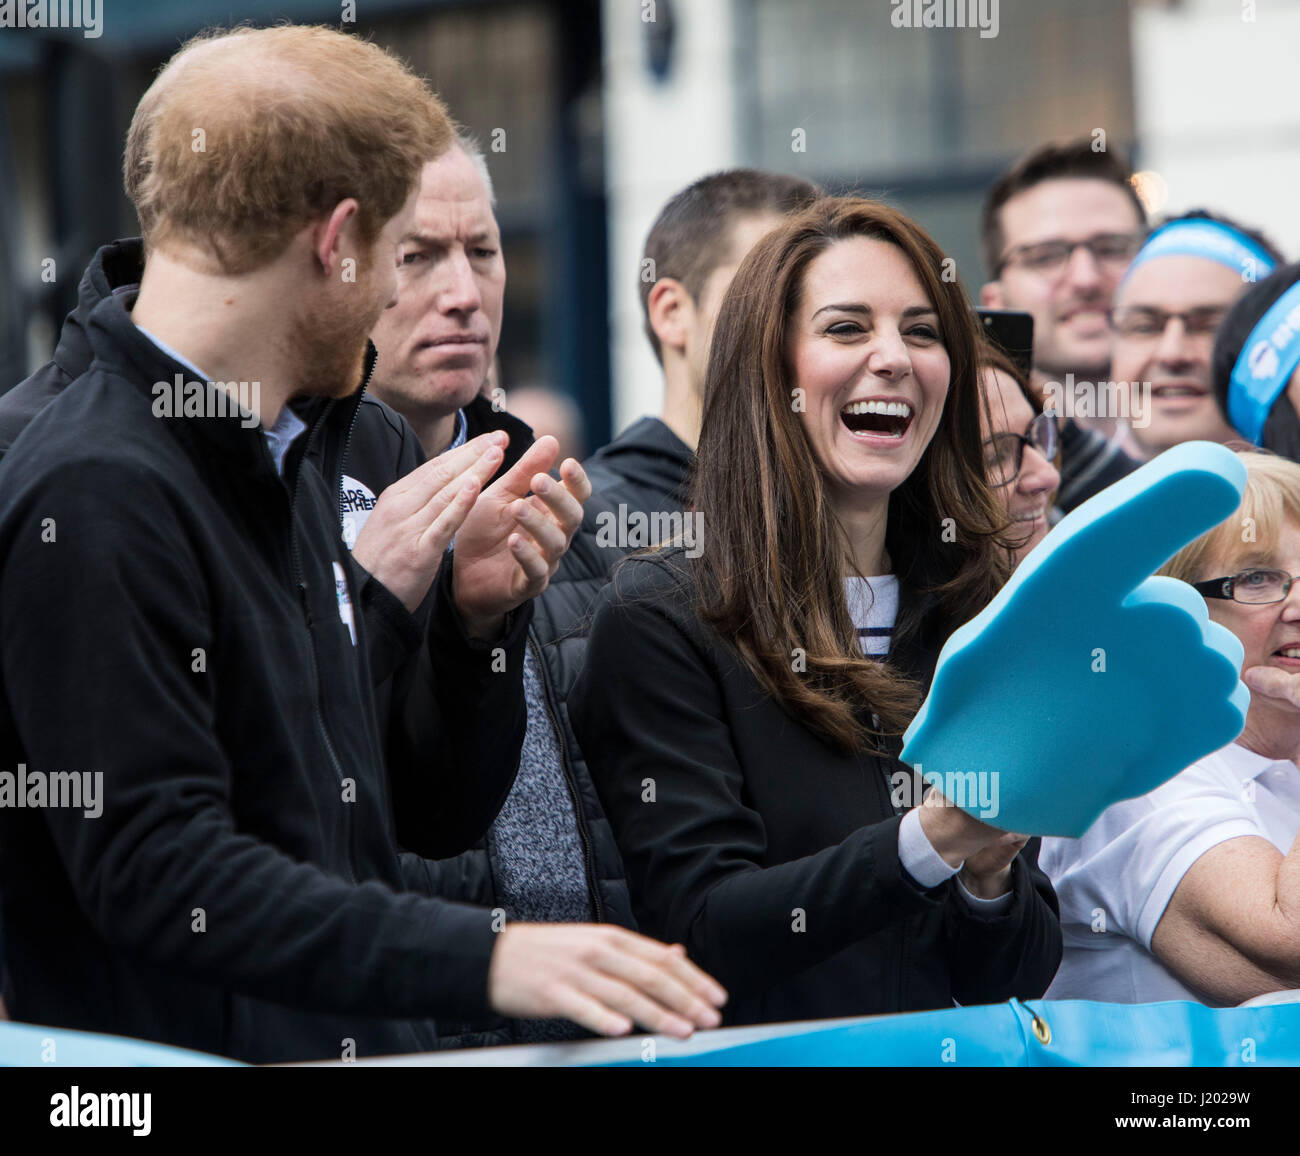 London, UK. 23rd Apr, 2017.  Virgin Money London Marathon. Prince Harry, Prince William, the Duke of Cambridge and Stock Photo